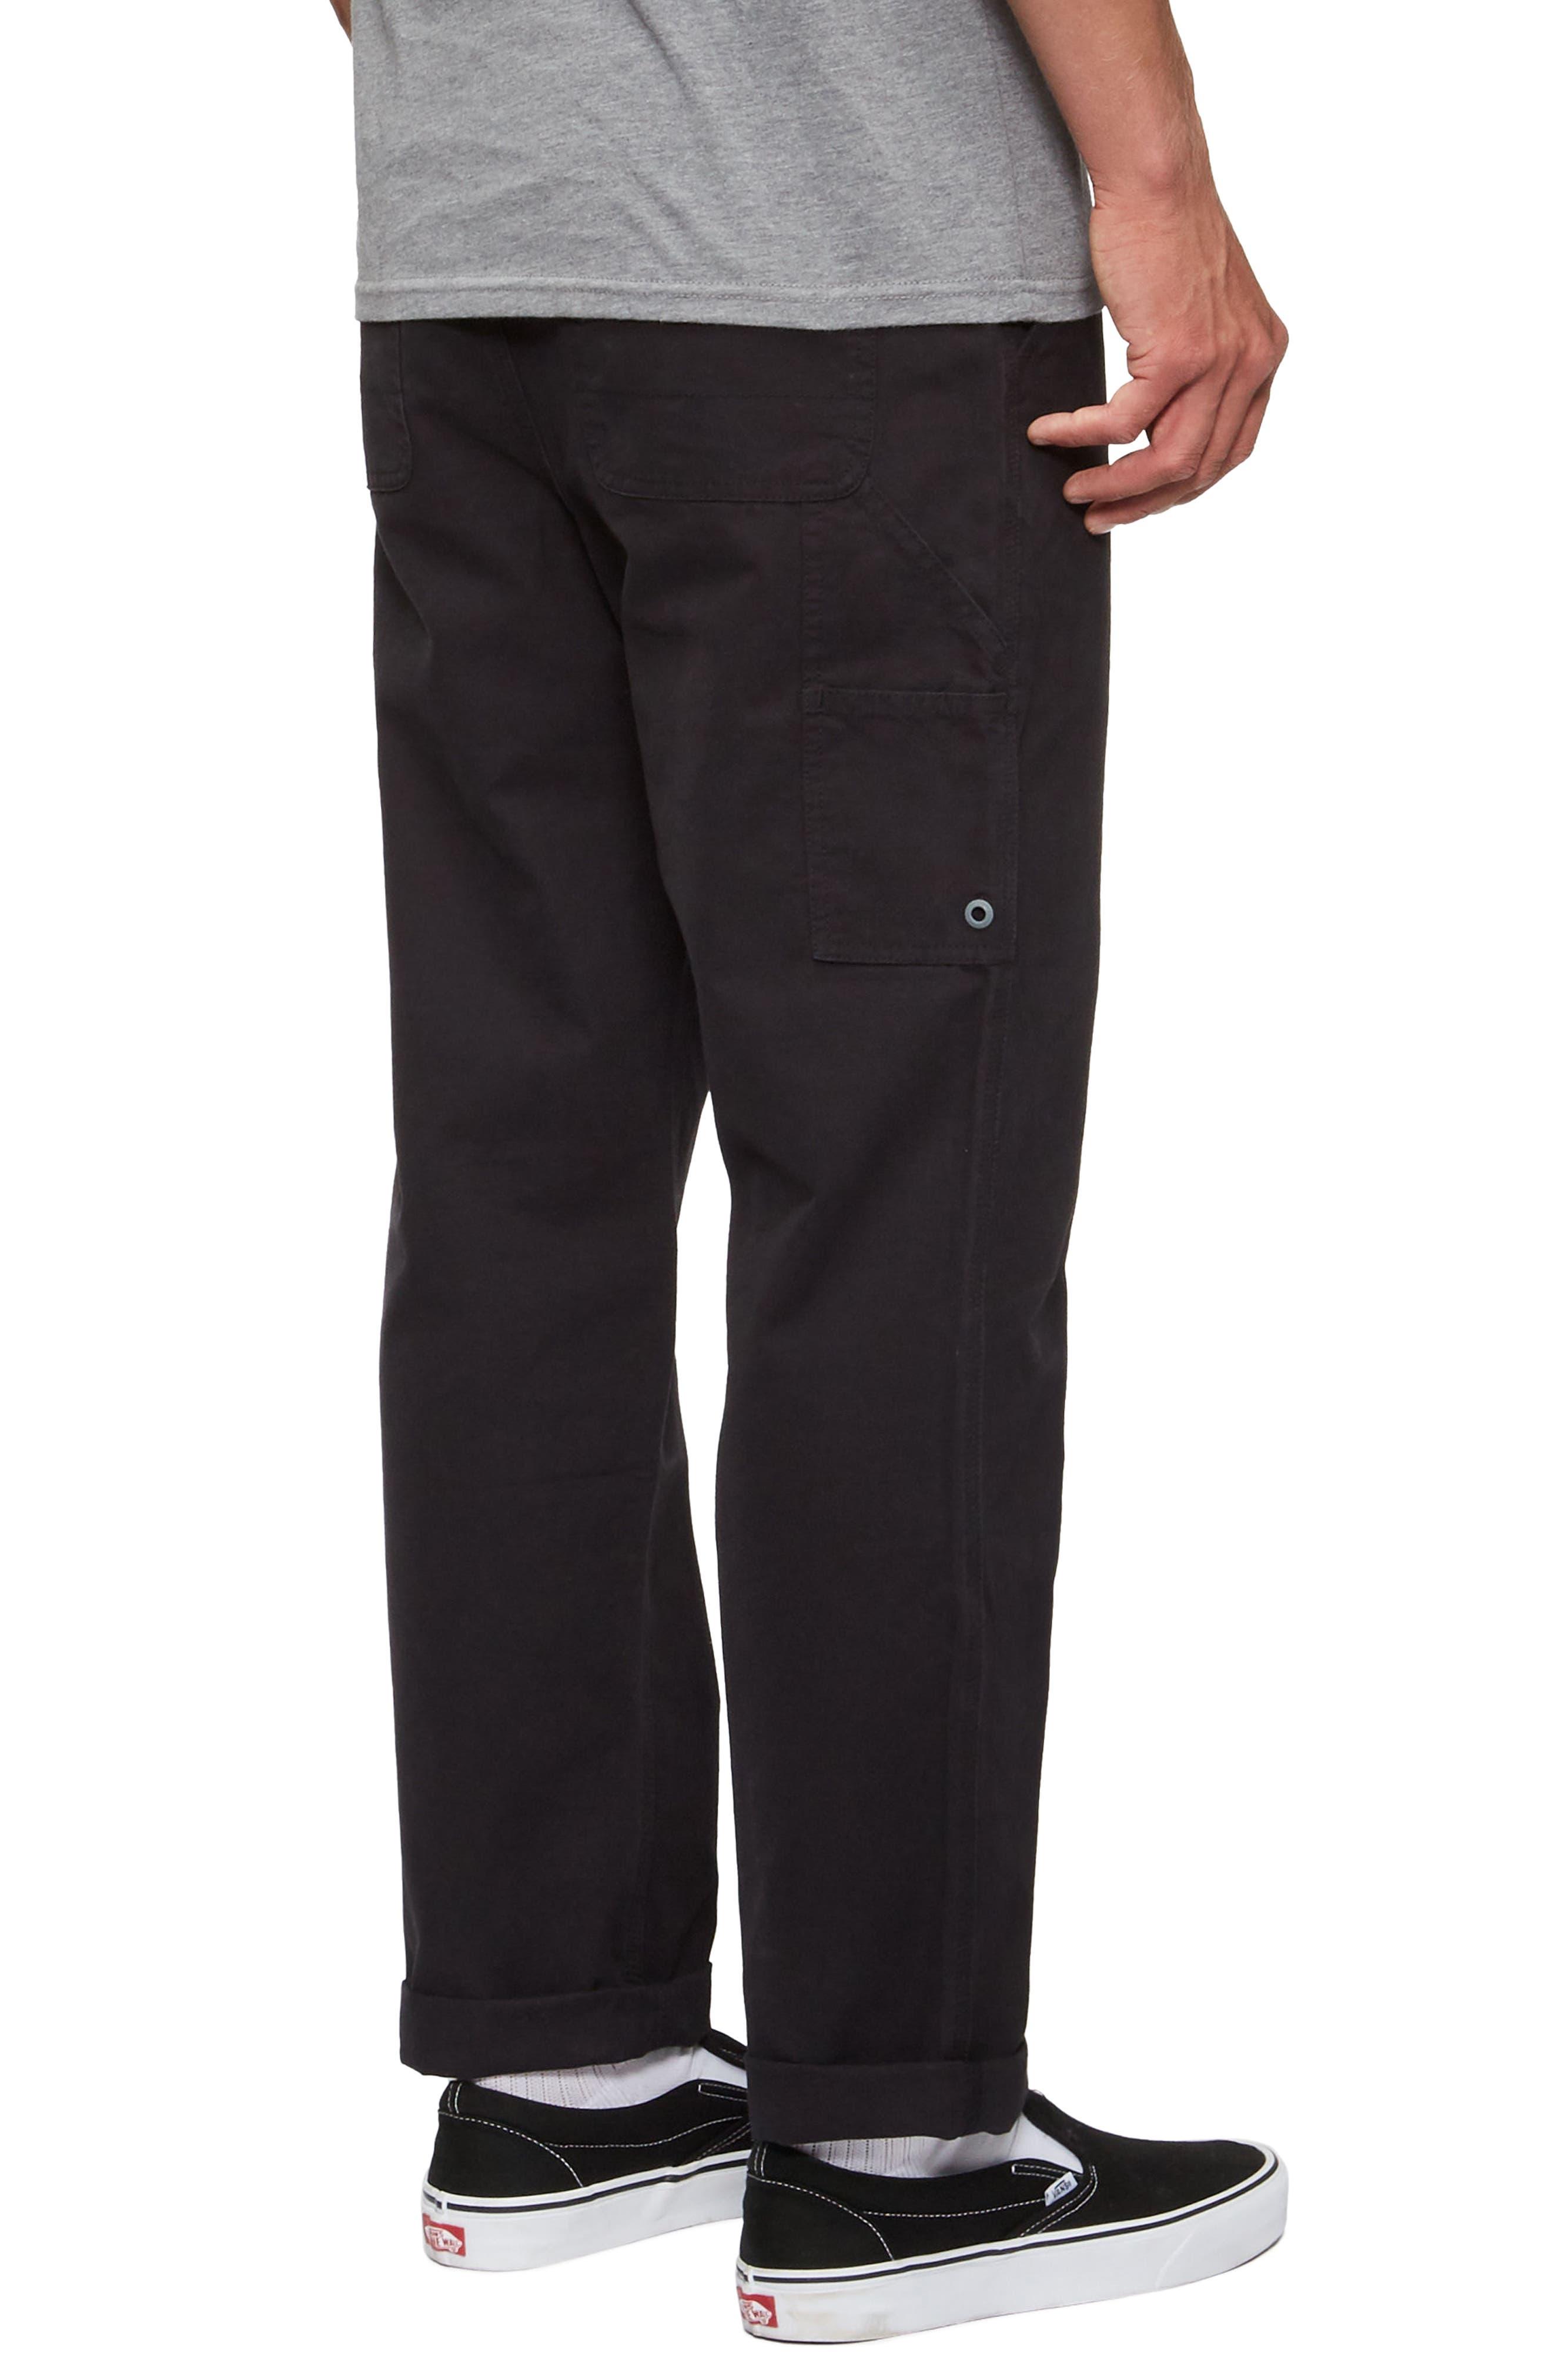 Westport Utility Pants,                             Alternate thumbnail 2, color,                             BLACK